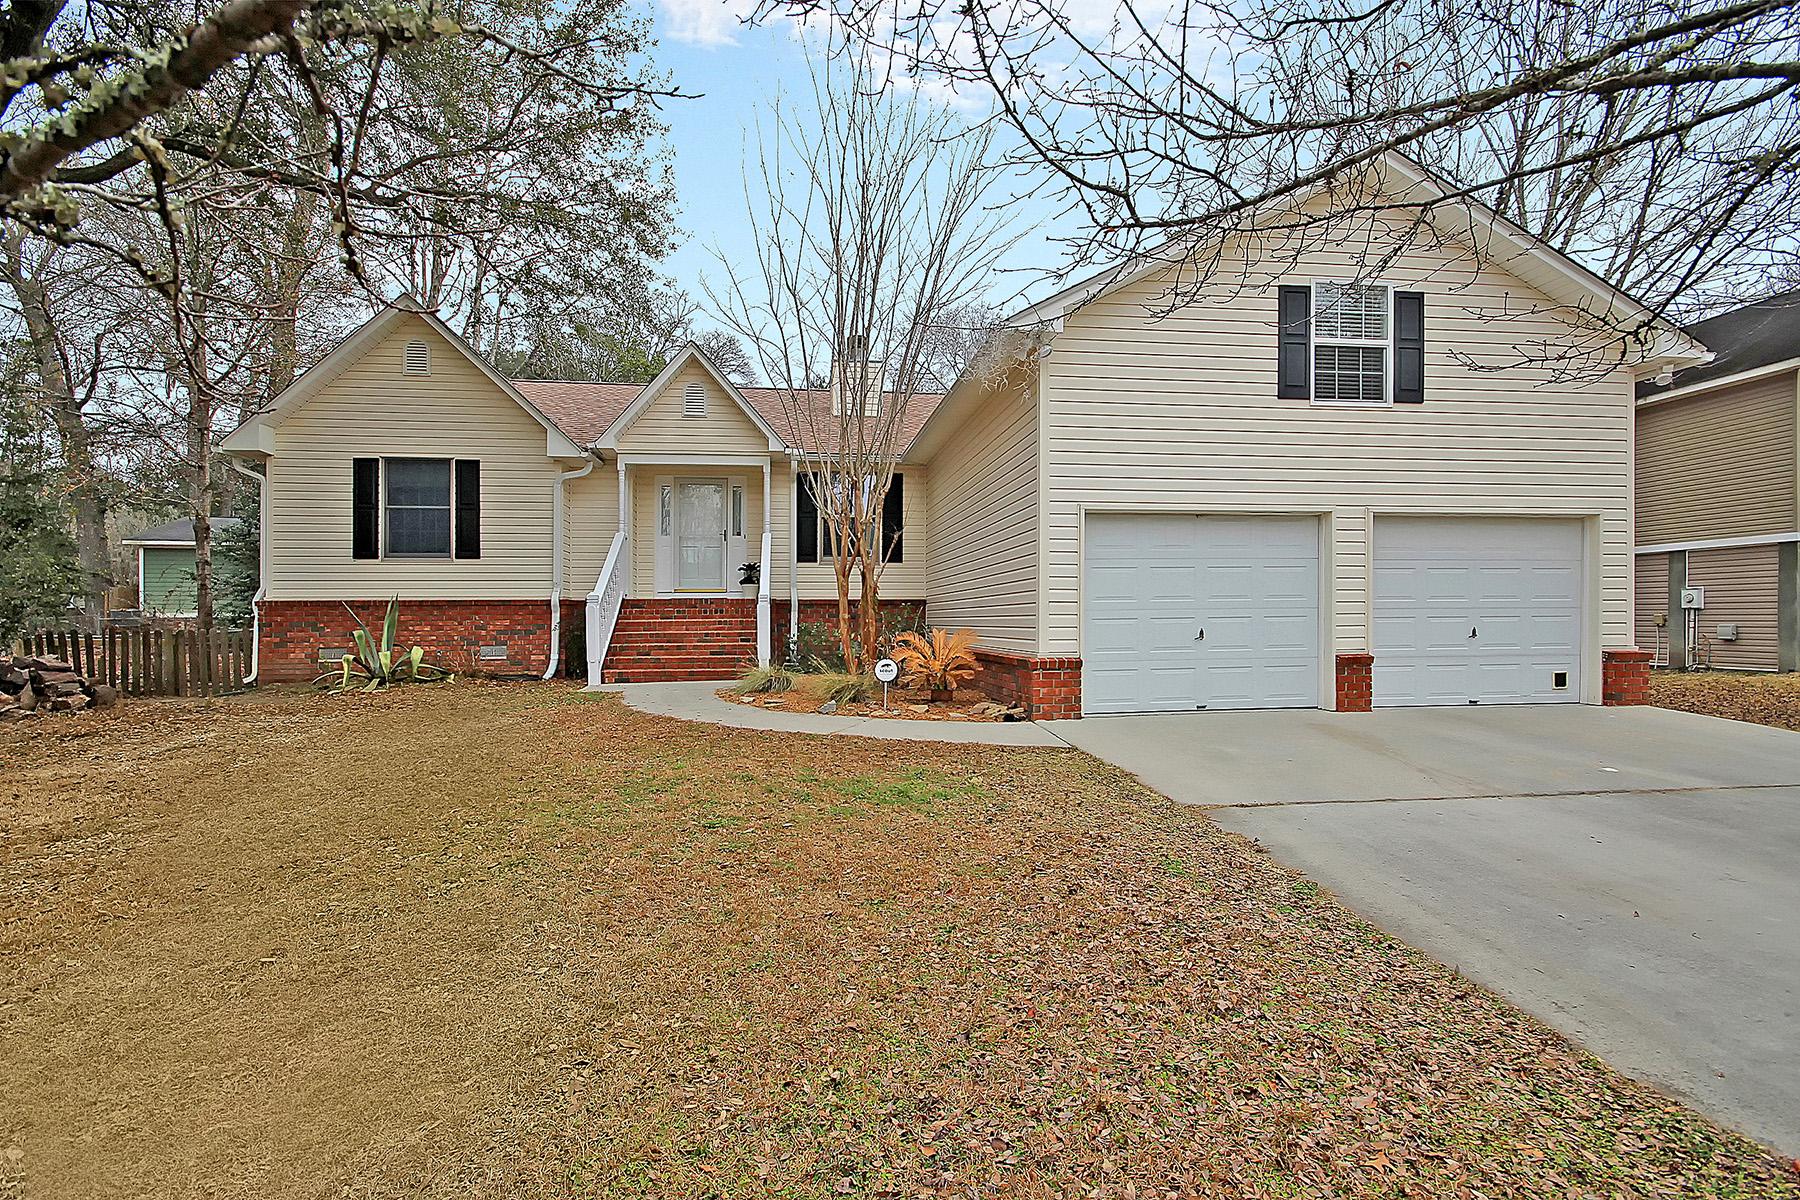 Single Family Home for Sale at 4628 Sunny Lane Charleston, South Carolina, 29405 United States